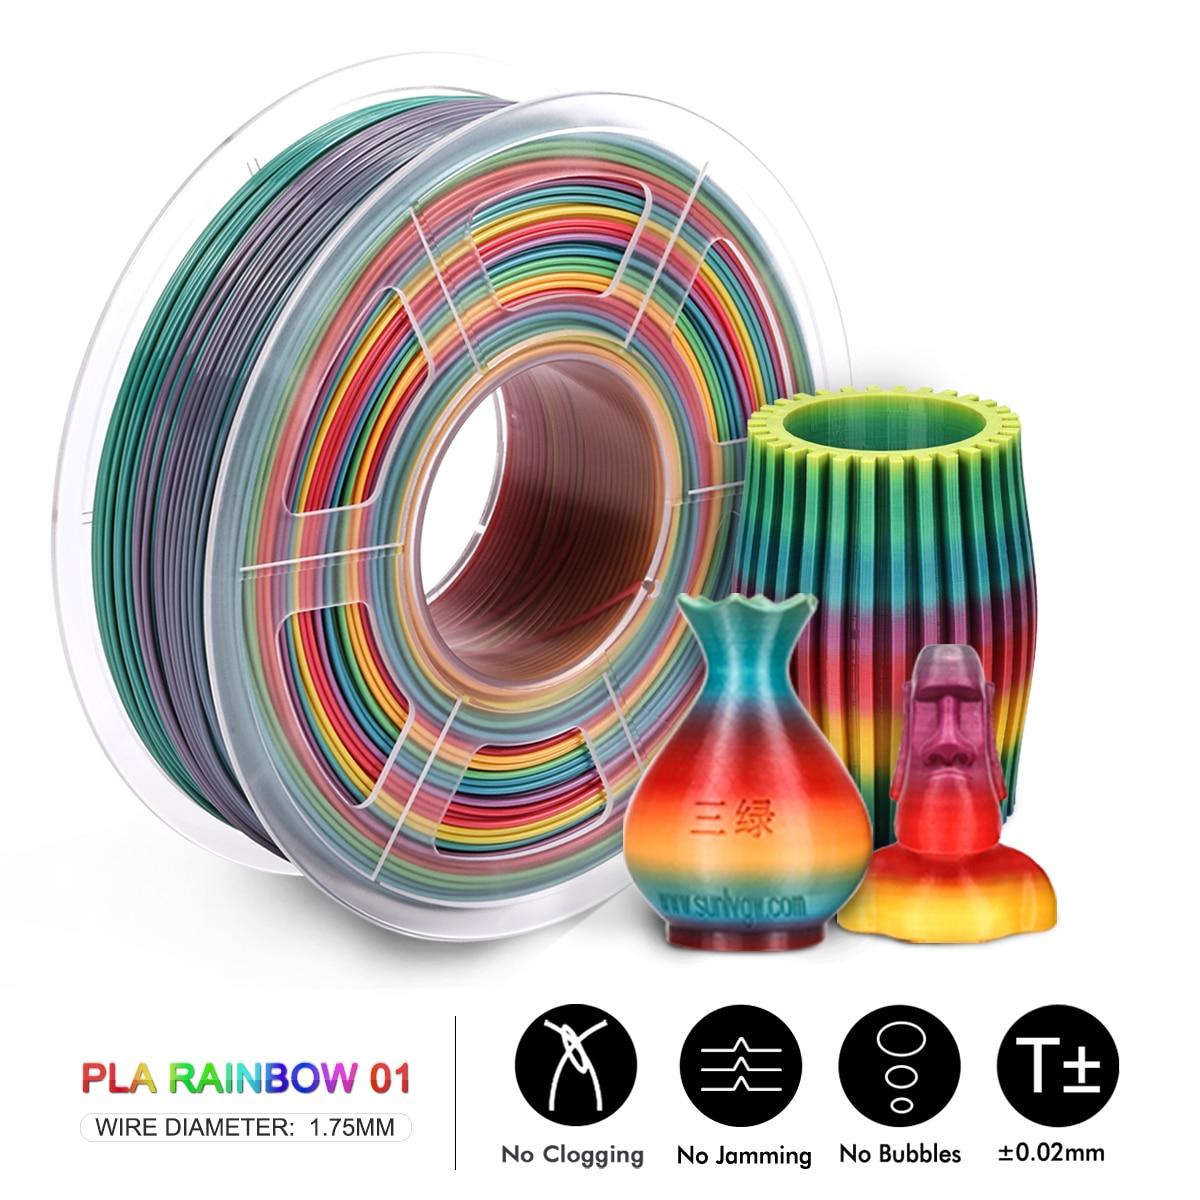 KAIGE PLA قوس قزح 1.75 مللي متر 1 كجم ثلاثية الأبعاد طابعة التسامي خيوط ل لون قوس قزح المواد لا انكماش 100% لا مزركشة صديقة للبيئة